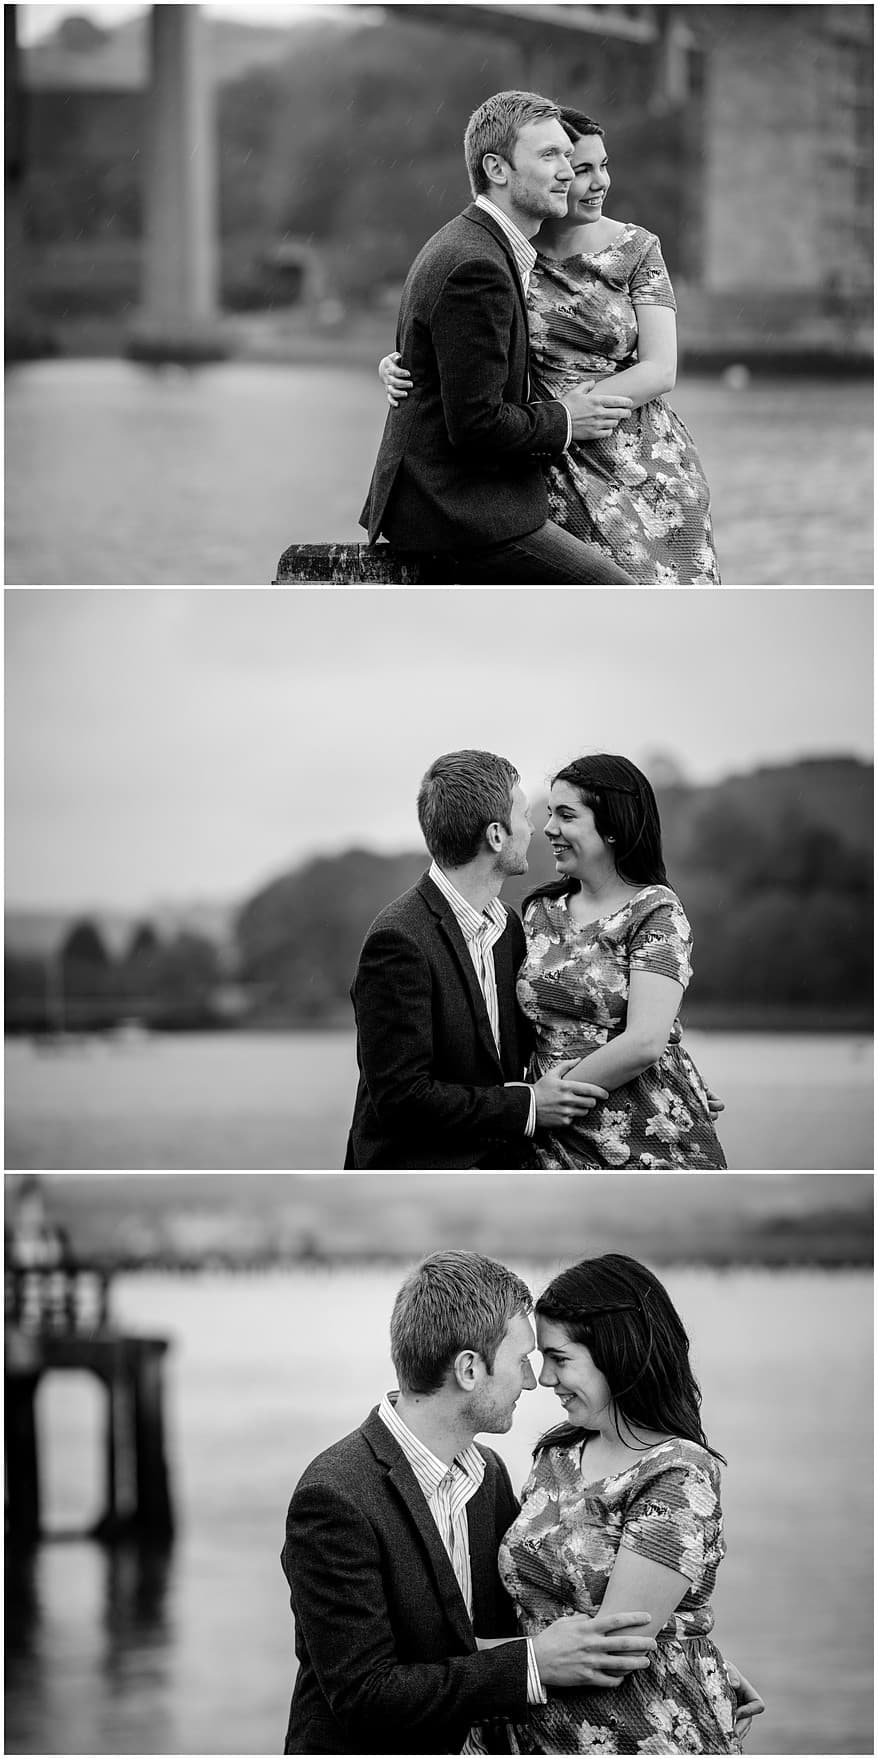 engaged couple enbraced on the pier in Saltashr